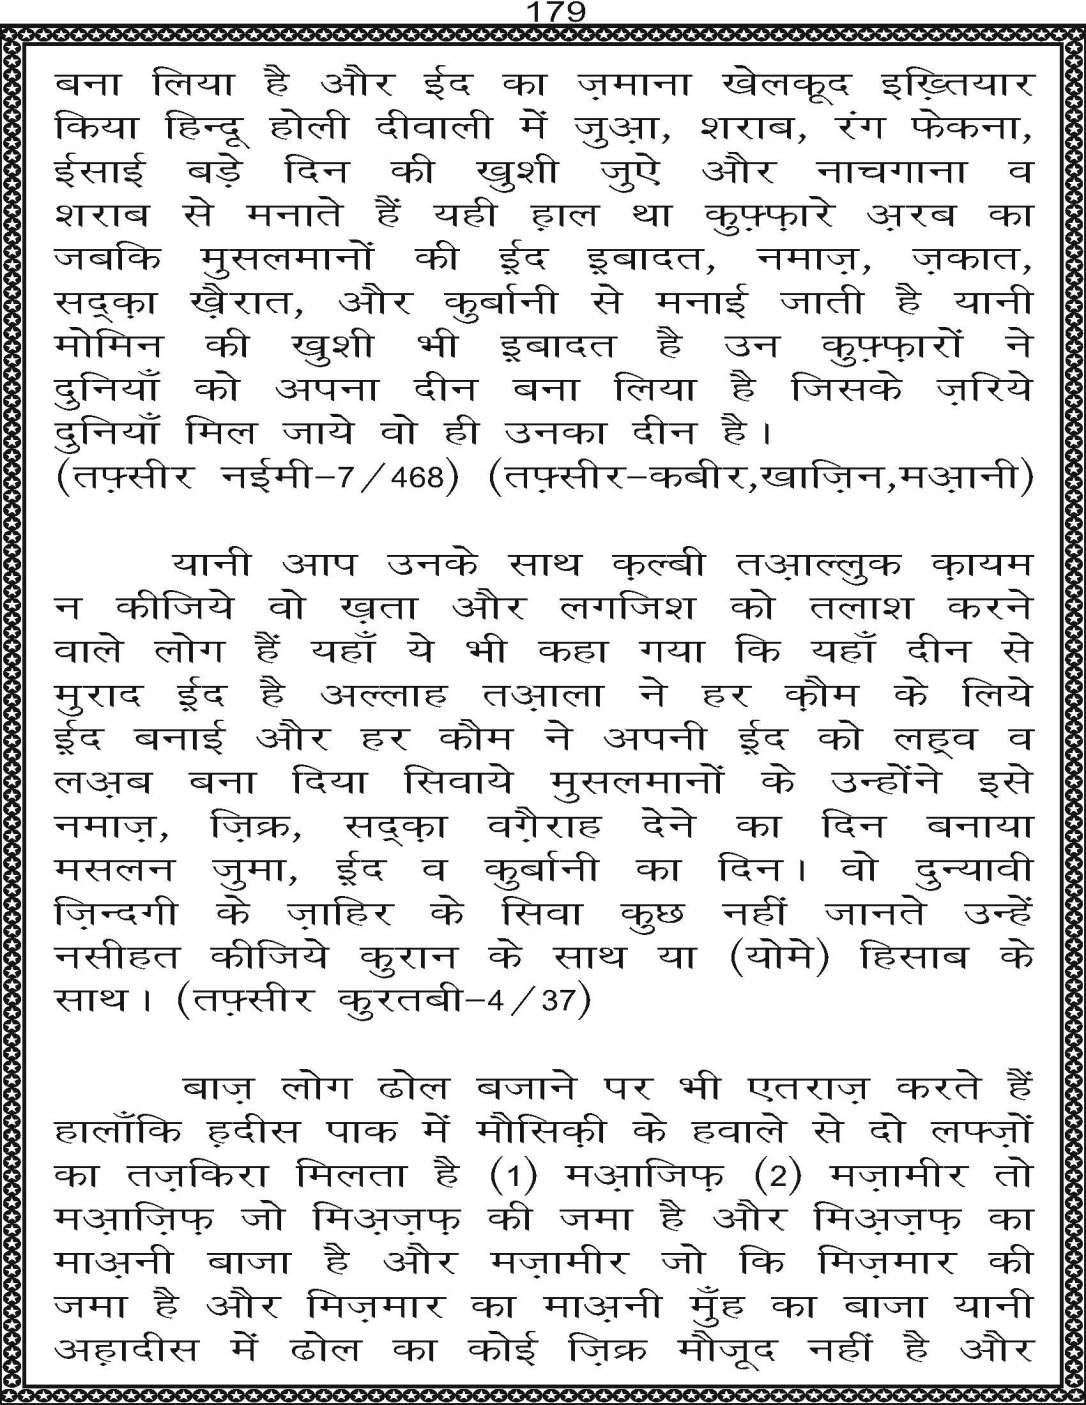 AzmateTaziyadari_Page_179